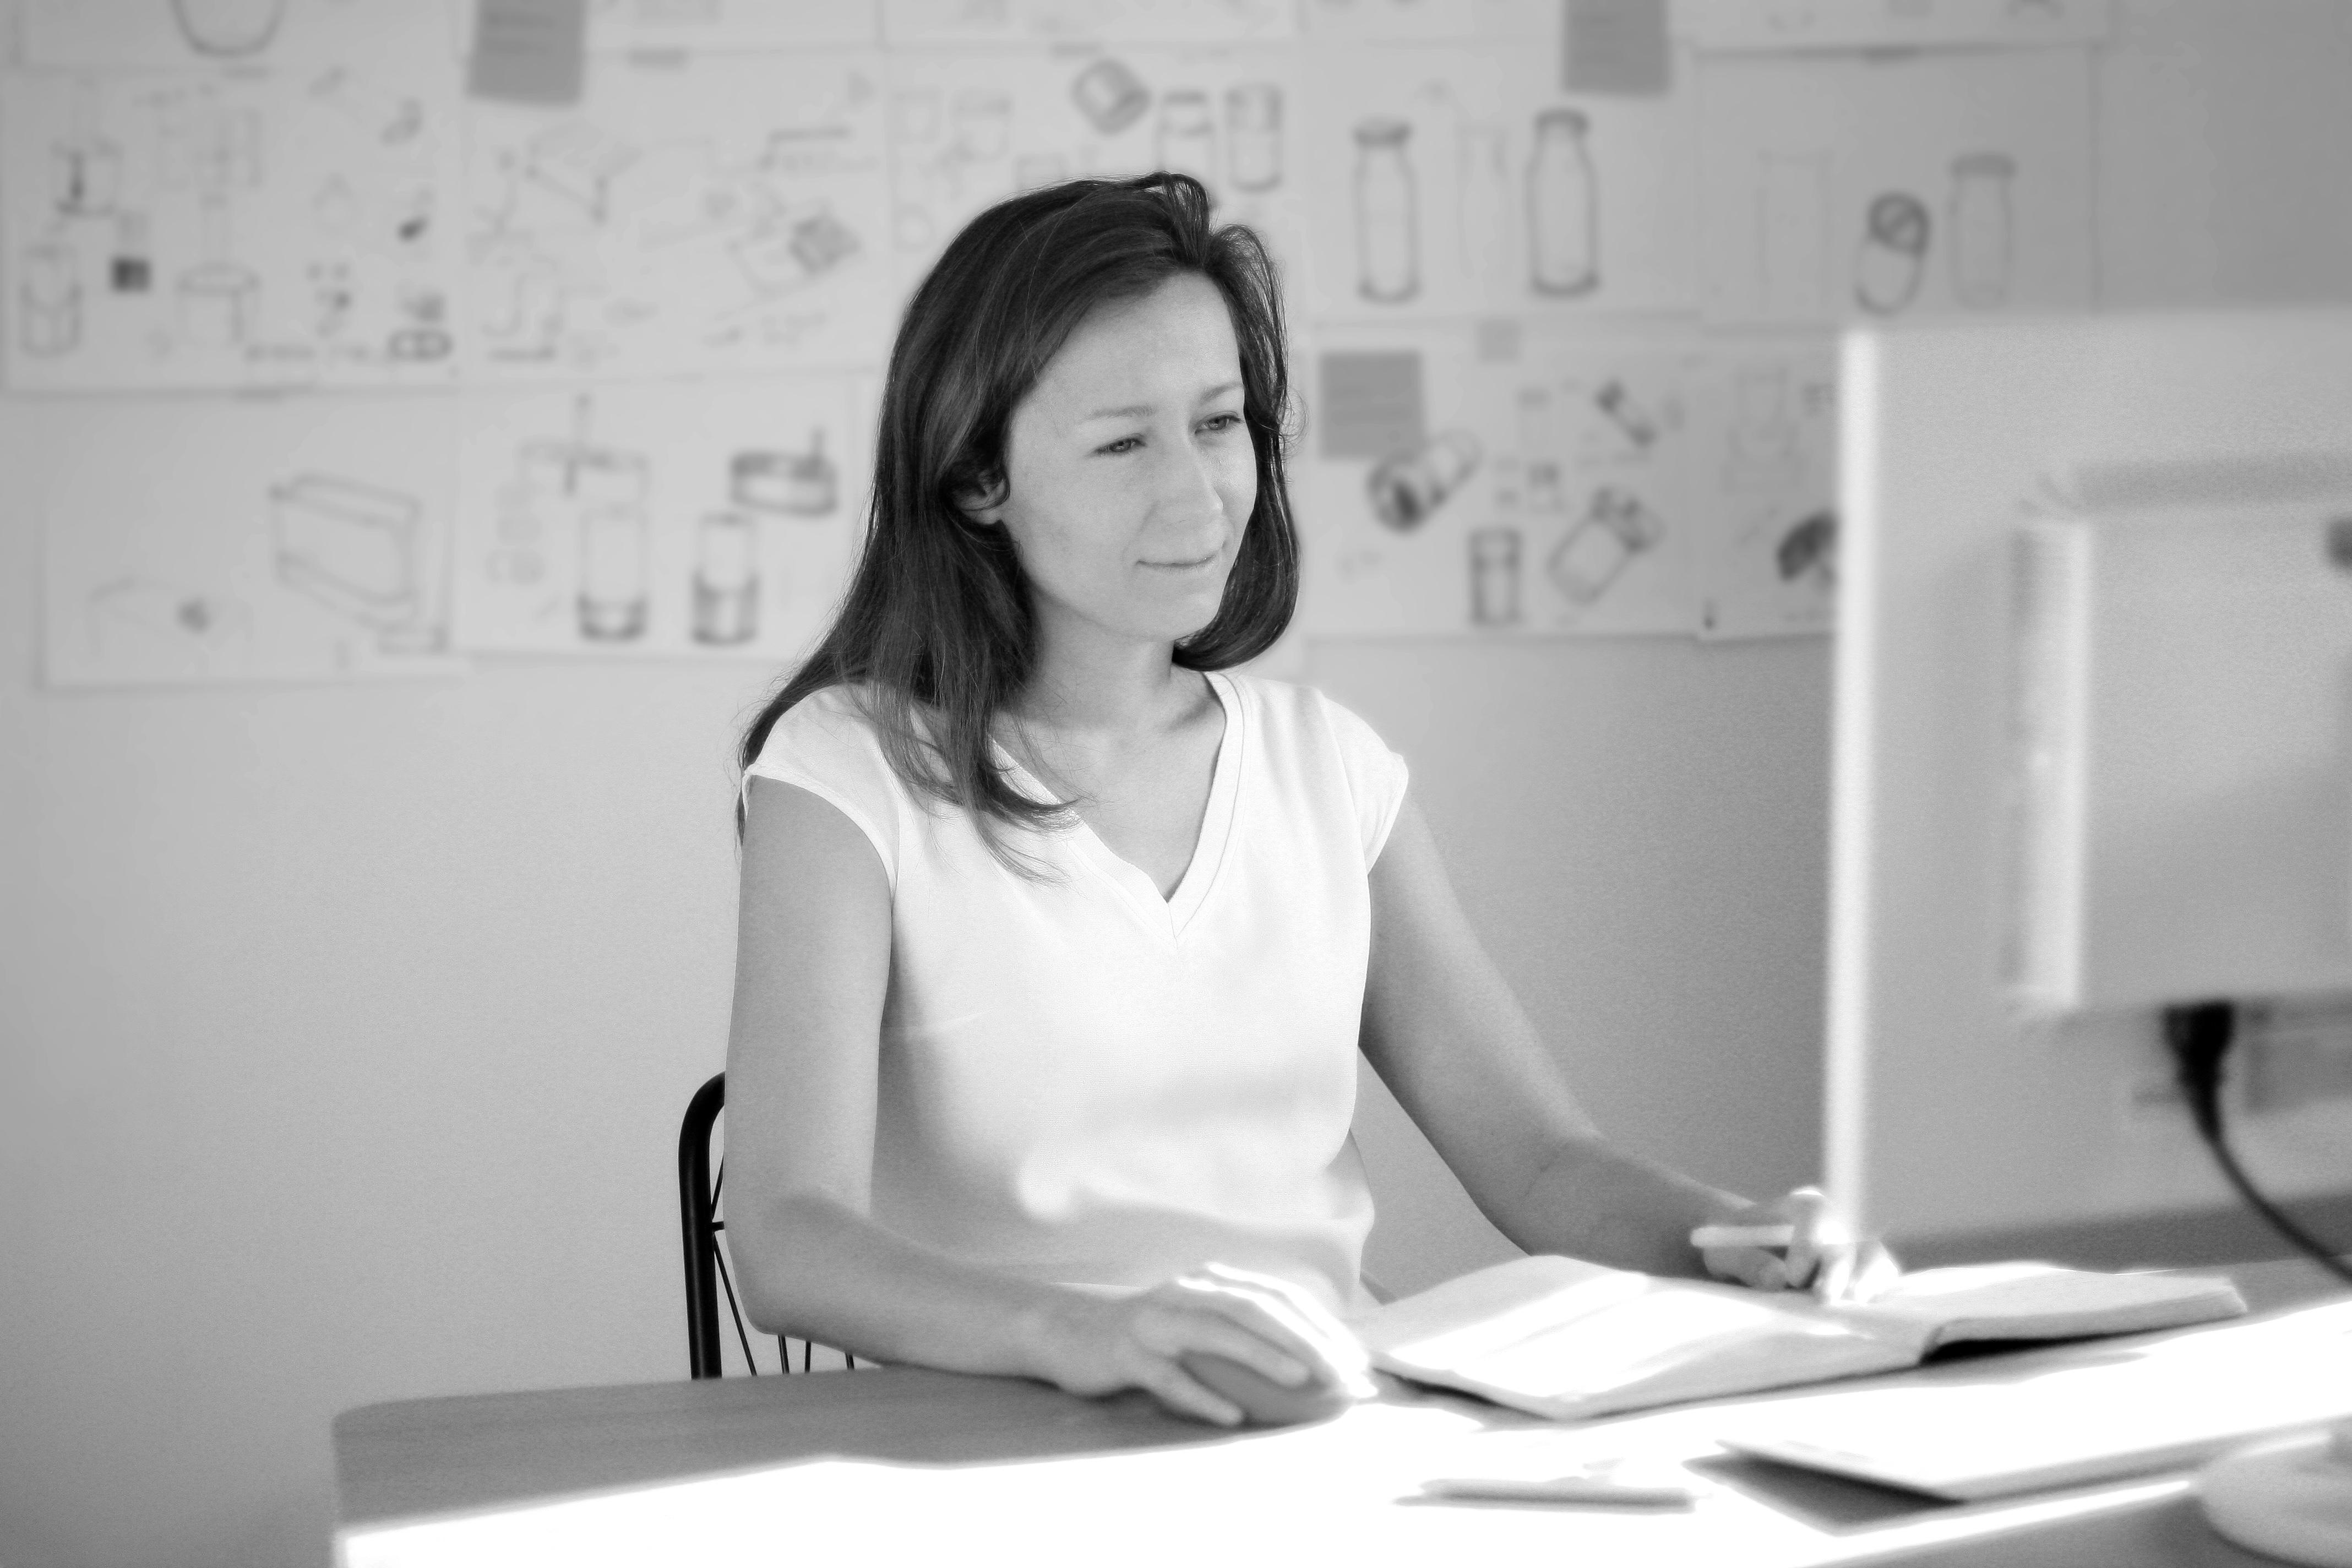 Gabi Potsa designer and owner of Entrive in front of sketches